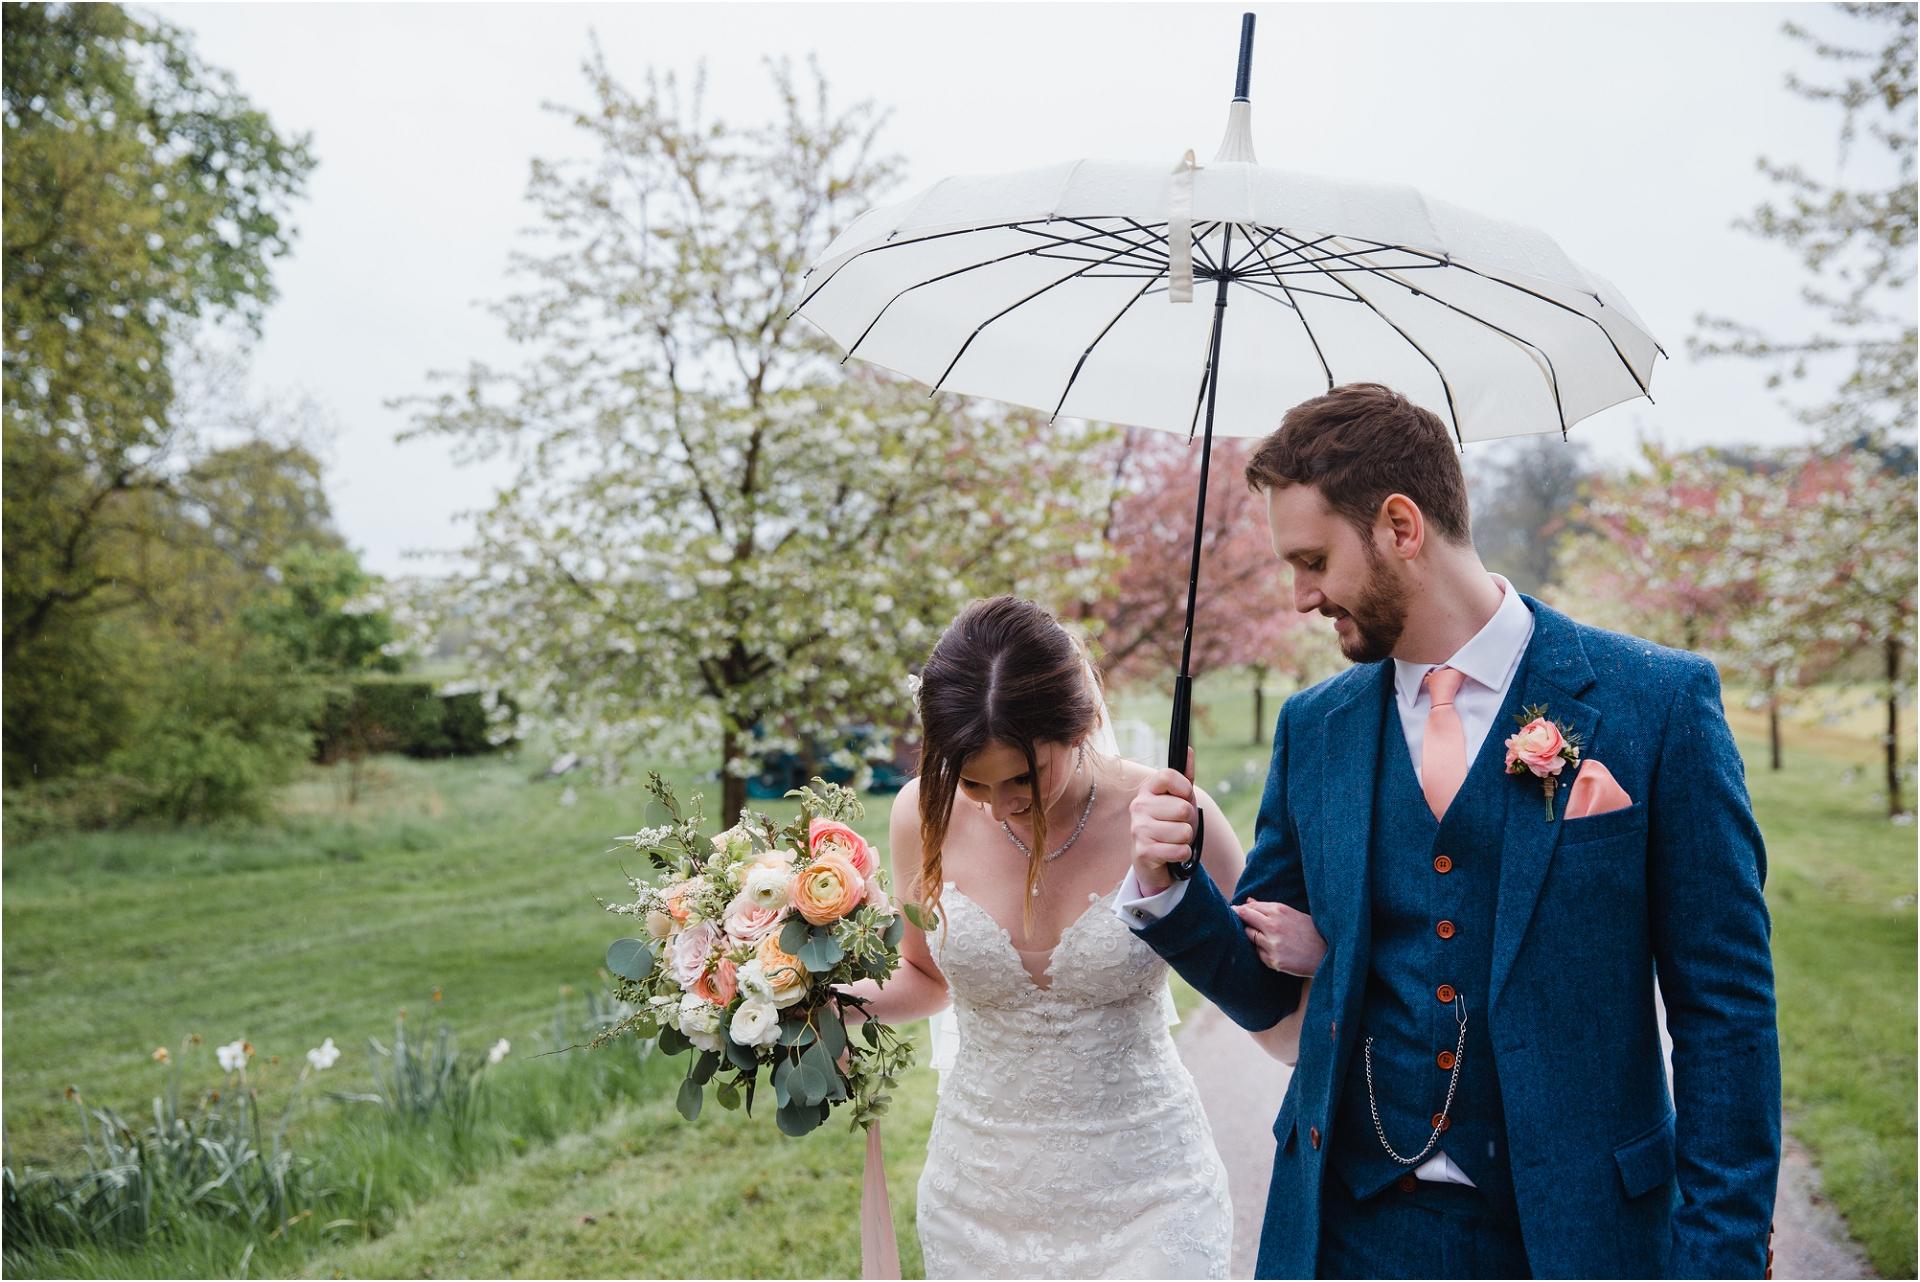 Rainy wedding umbrella photography